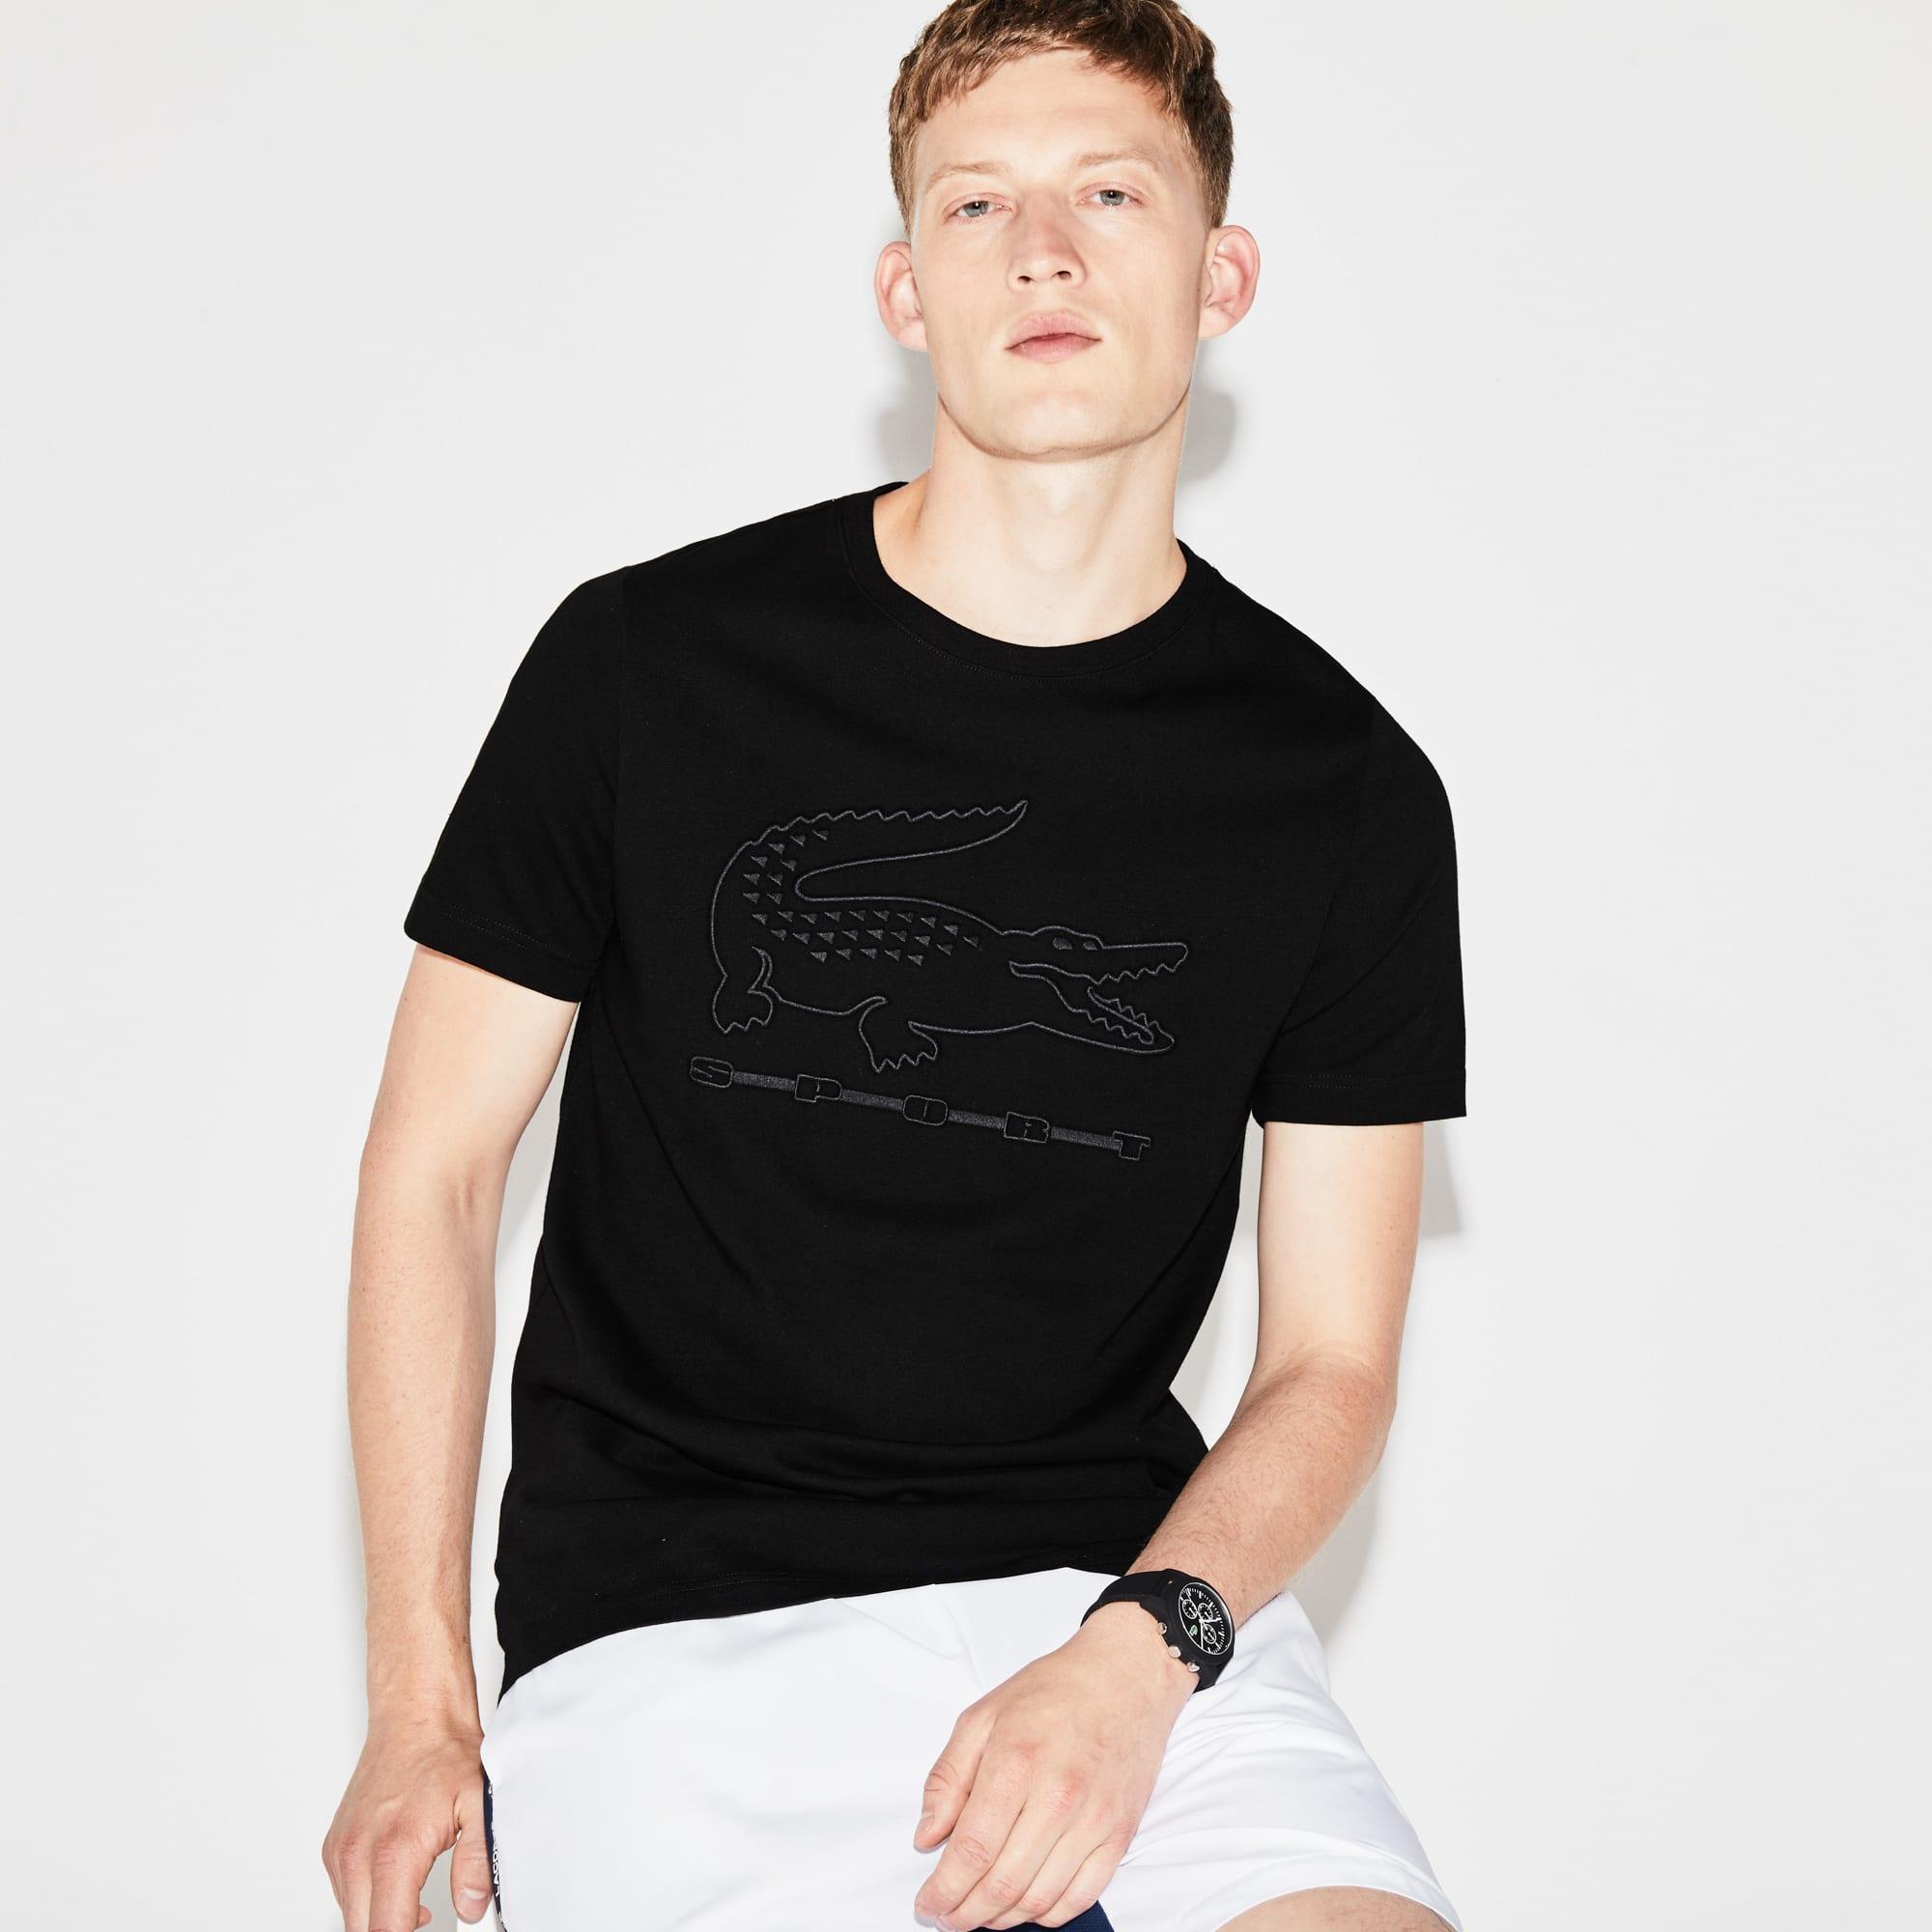 Men's Lacoste SPORT Tennis Embroidery Tech Jersey T-shirt